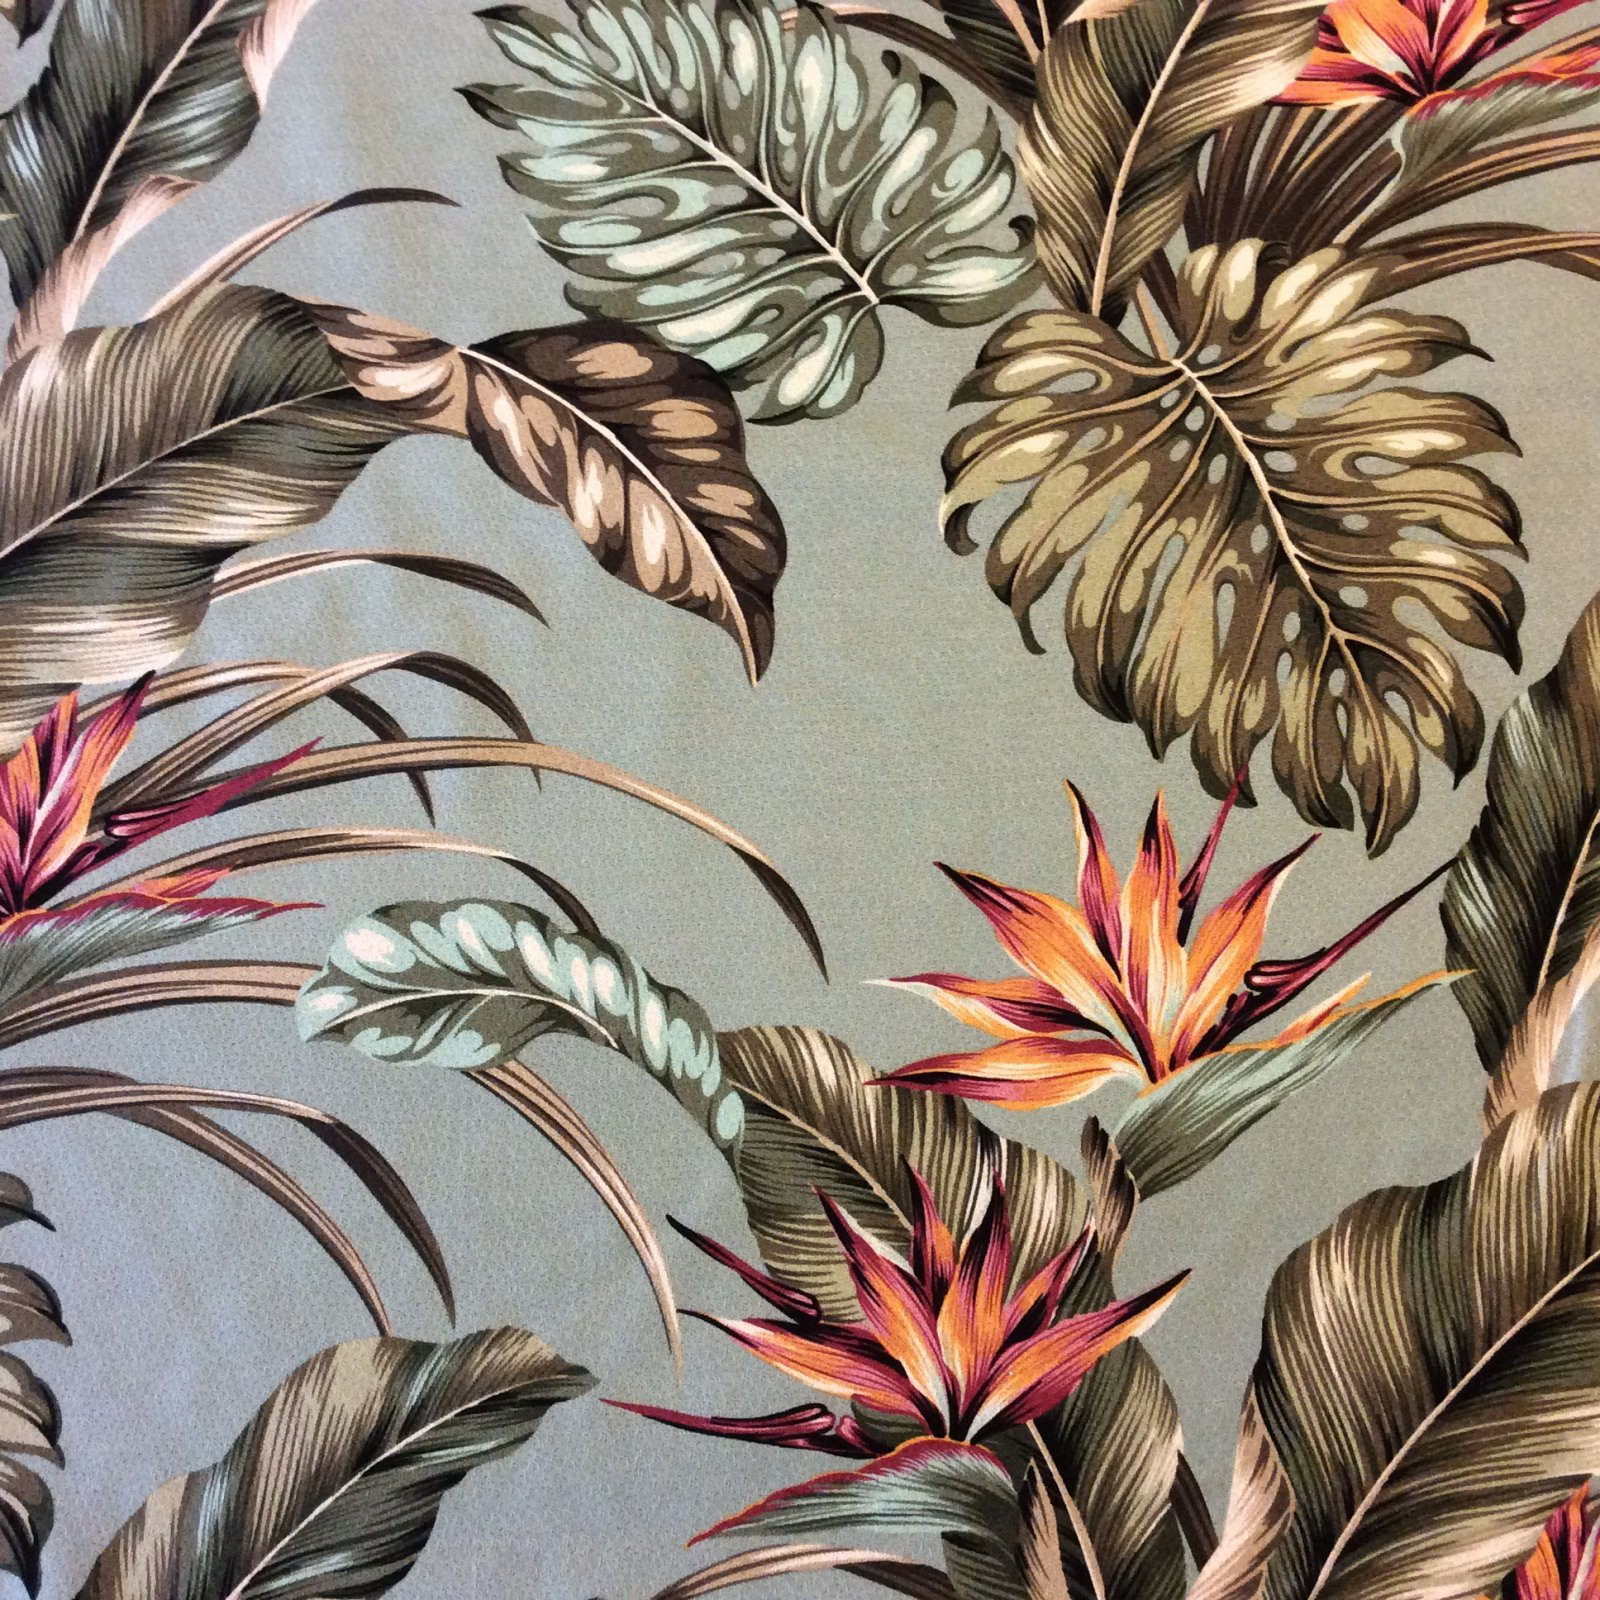 COMING SOON 2017 Atomic Barkcloth Style Palm Flower Tropical Tiki Bar Luau Cotton Dobby Fabric Surf Style Lanai HTP021